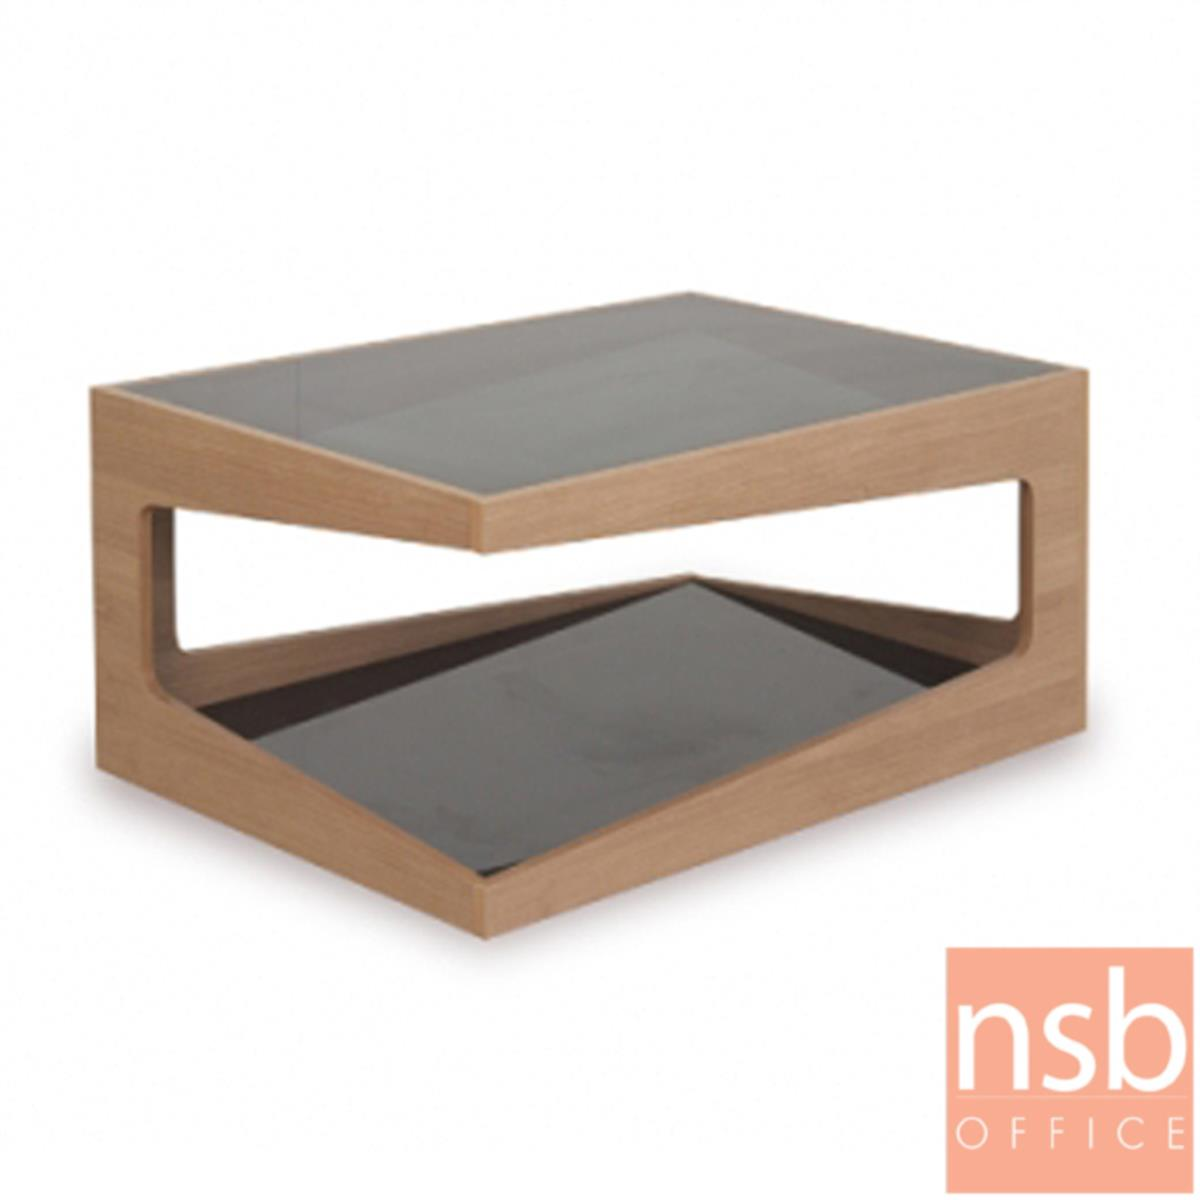 B13A244:โต๊ะกลางโซฟากระจก  รุ่น GD-SE ขนาด 60W ,90Wcm.  โครงไม้